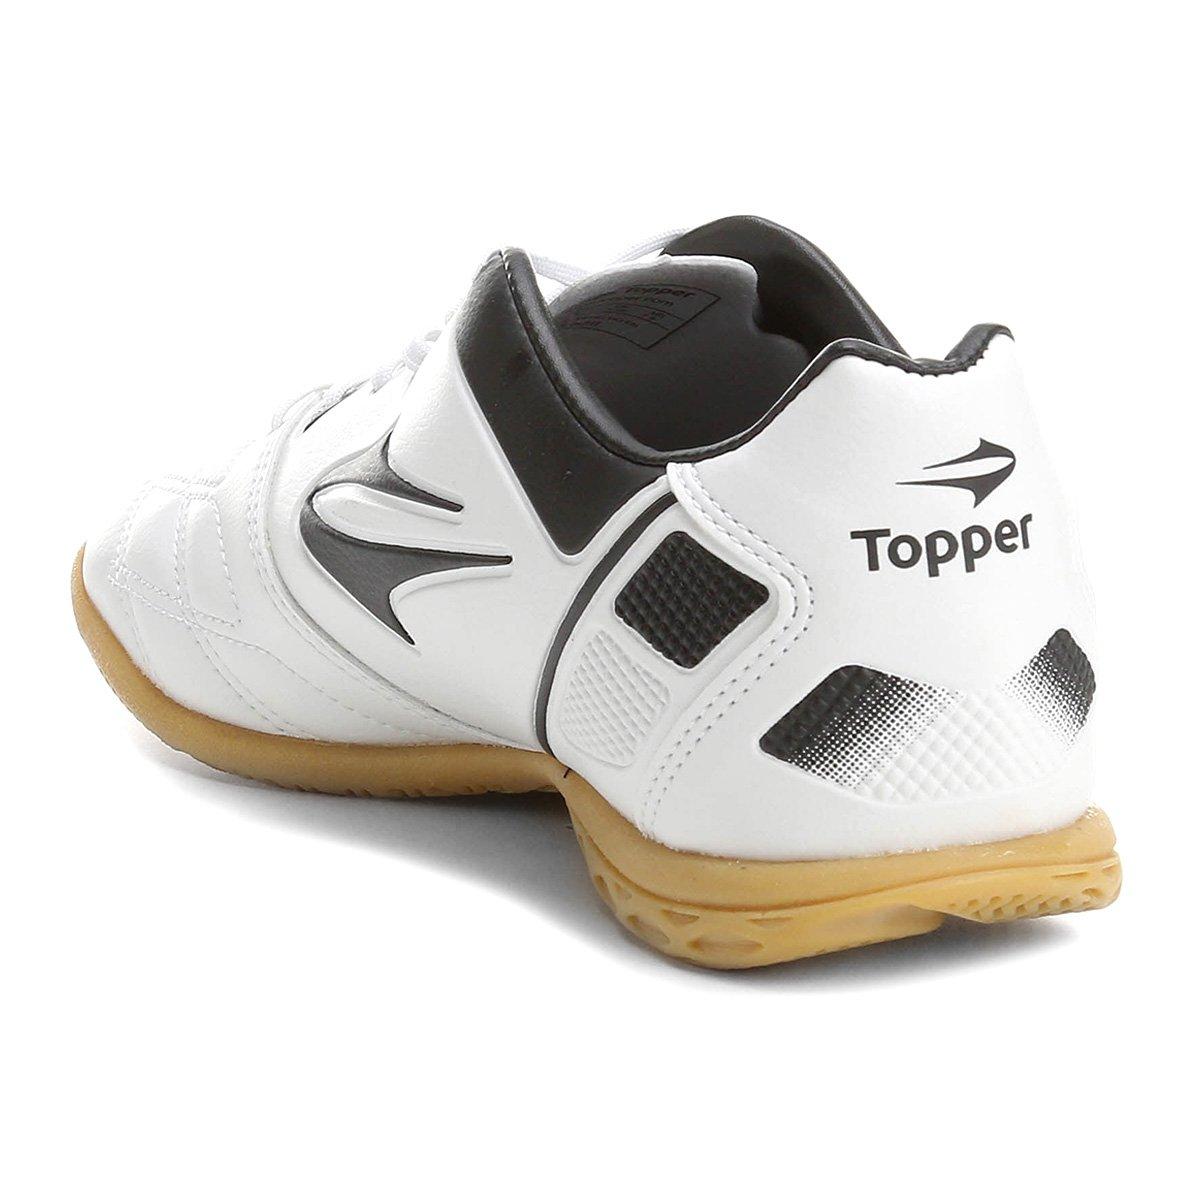 0d12a8b74b Chuteira Futsal Topper Champion 5 - Compre Agora